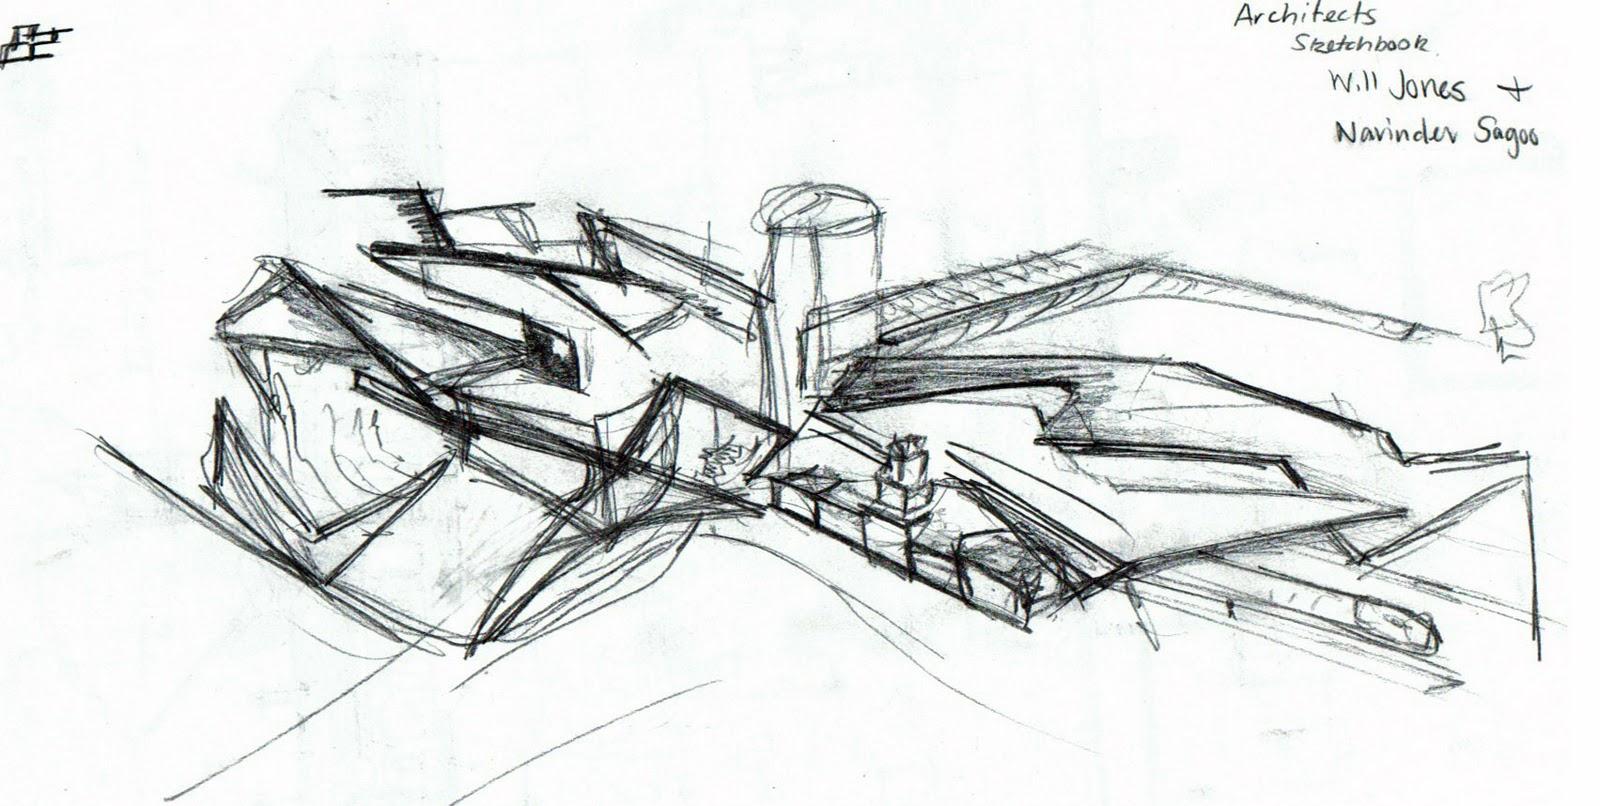 Pre Fab Architecture Initial Concept Sketch